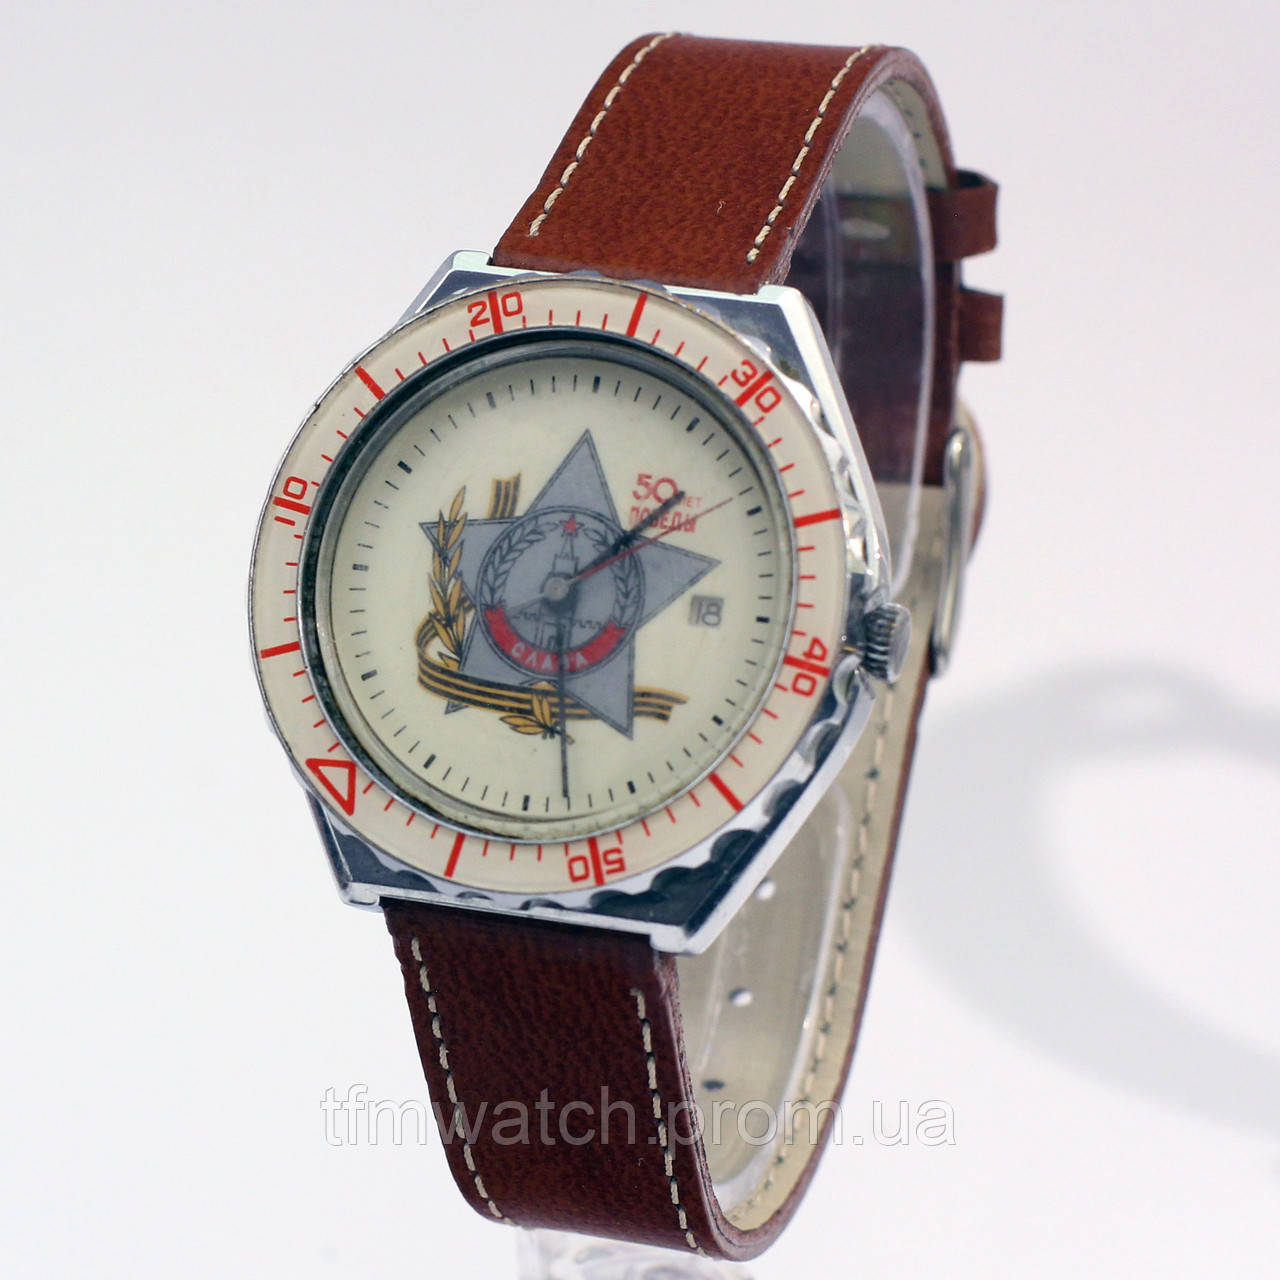 Часы 50 лет победы